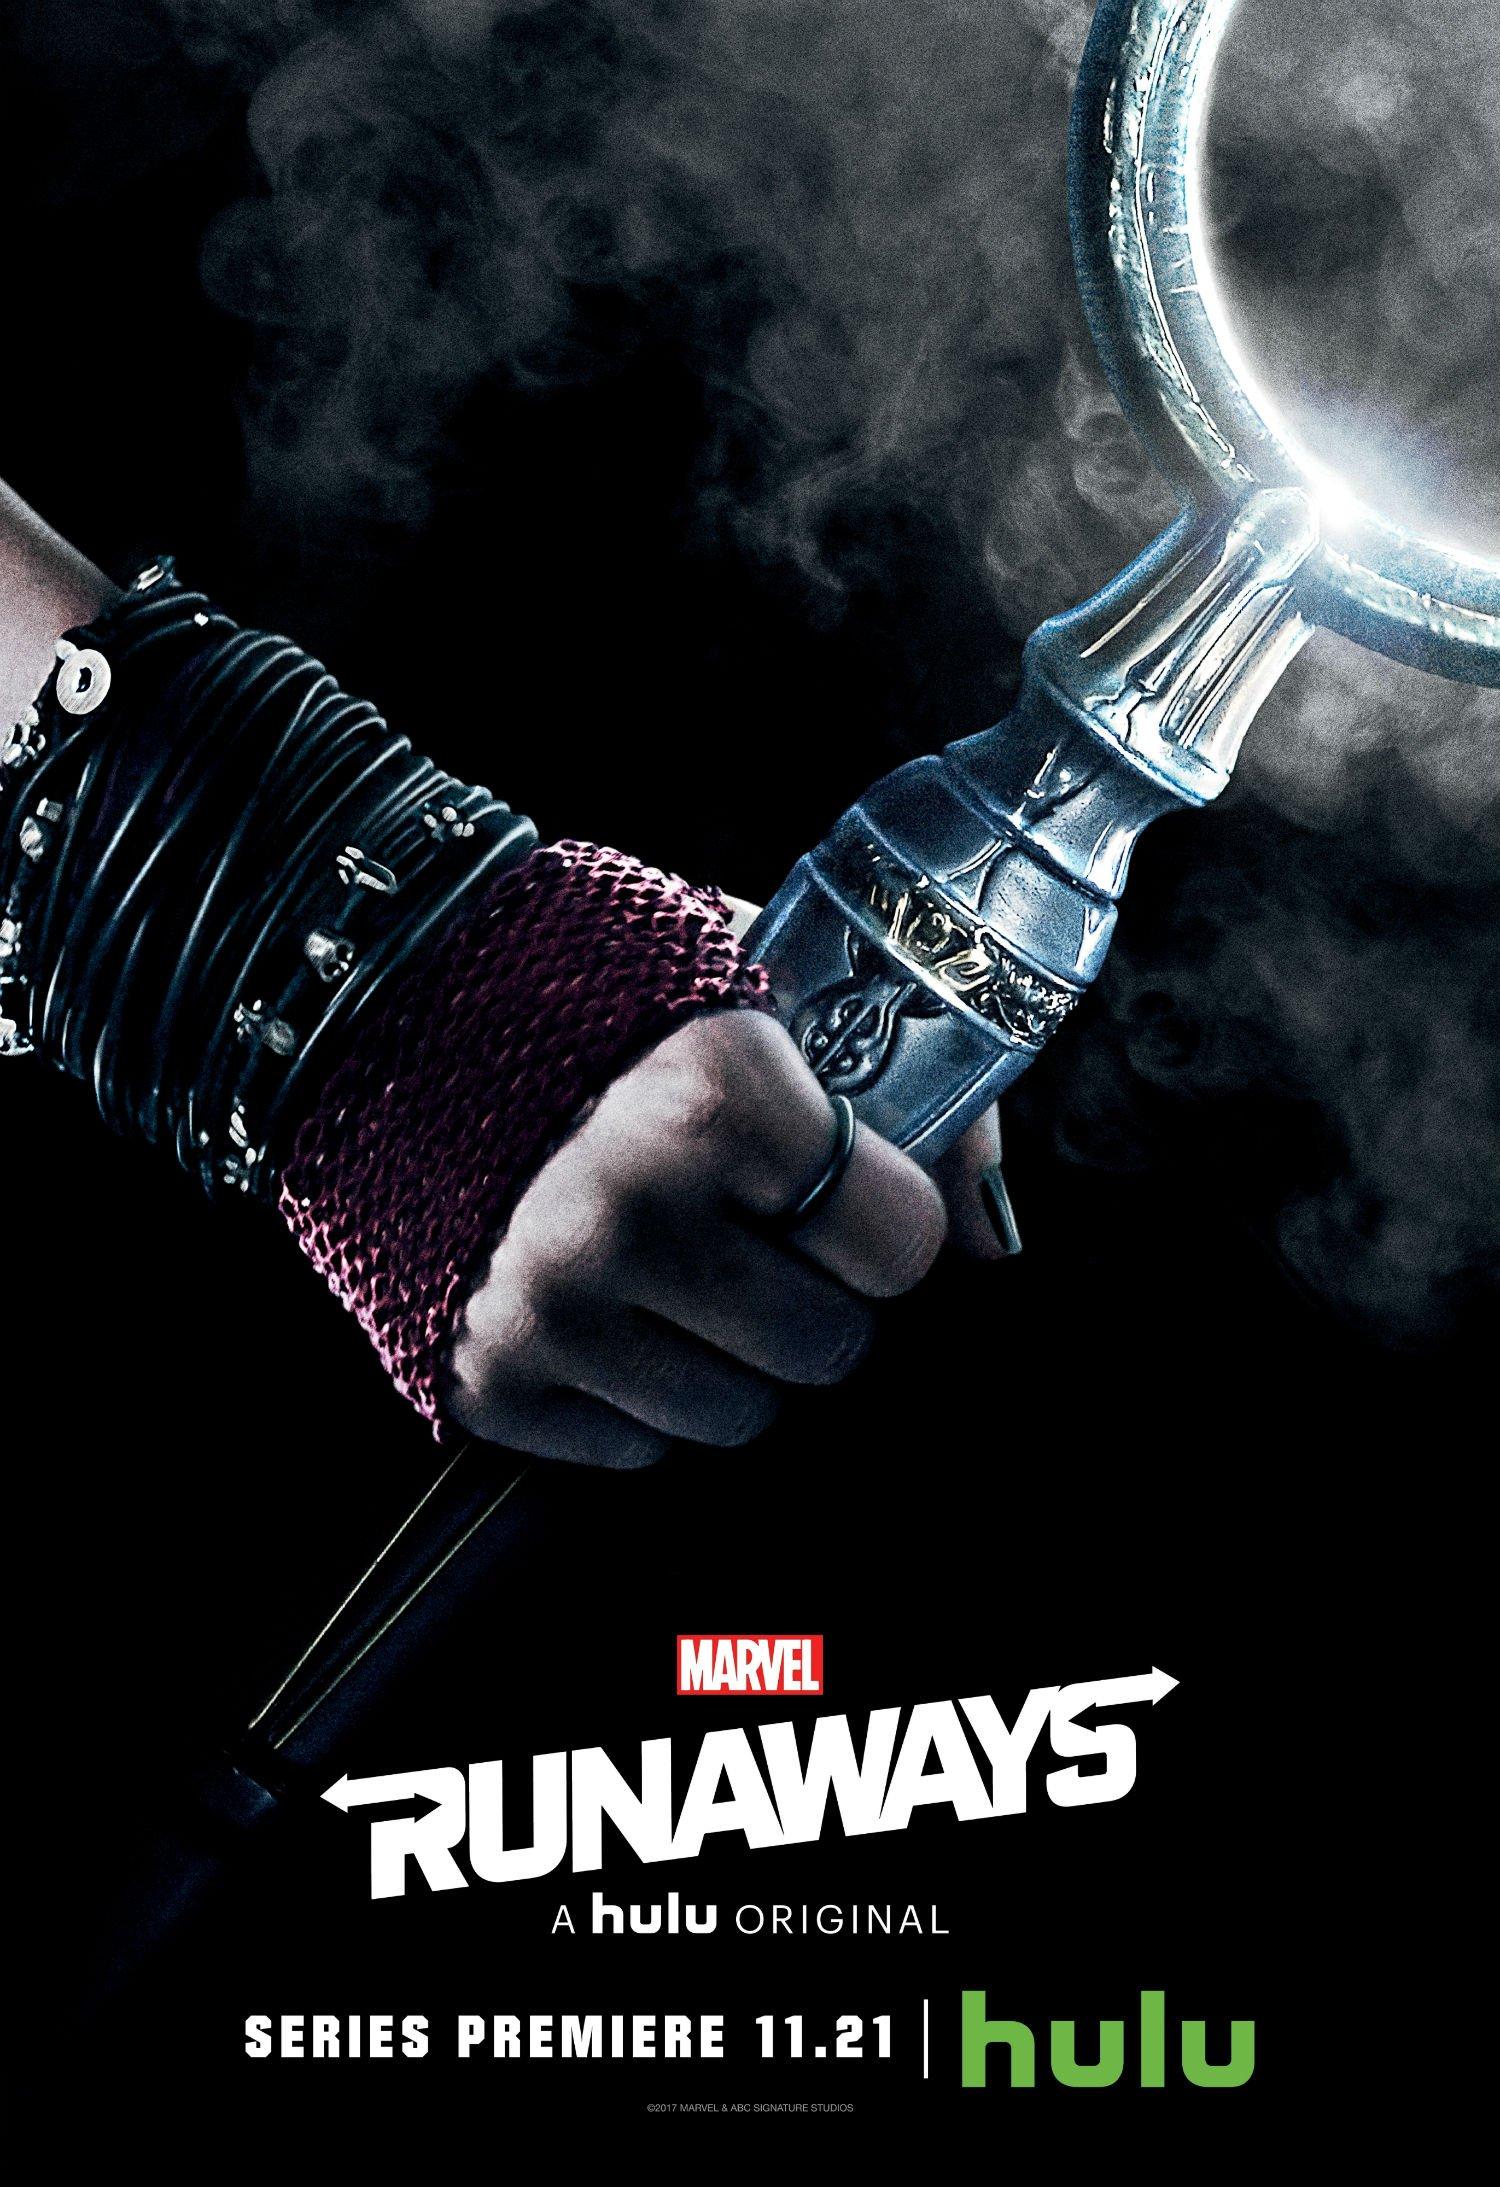 Poster de la saison 1 de Runaways avec le poing de Nico Minoru